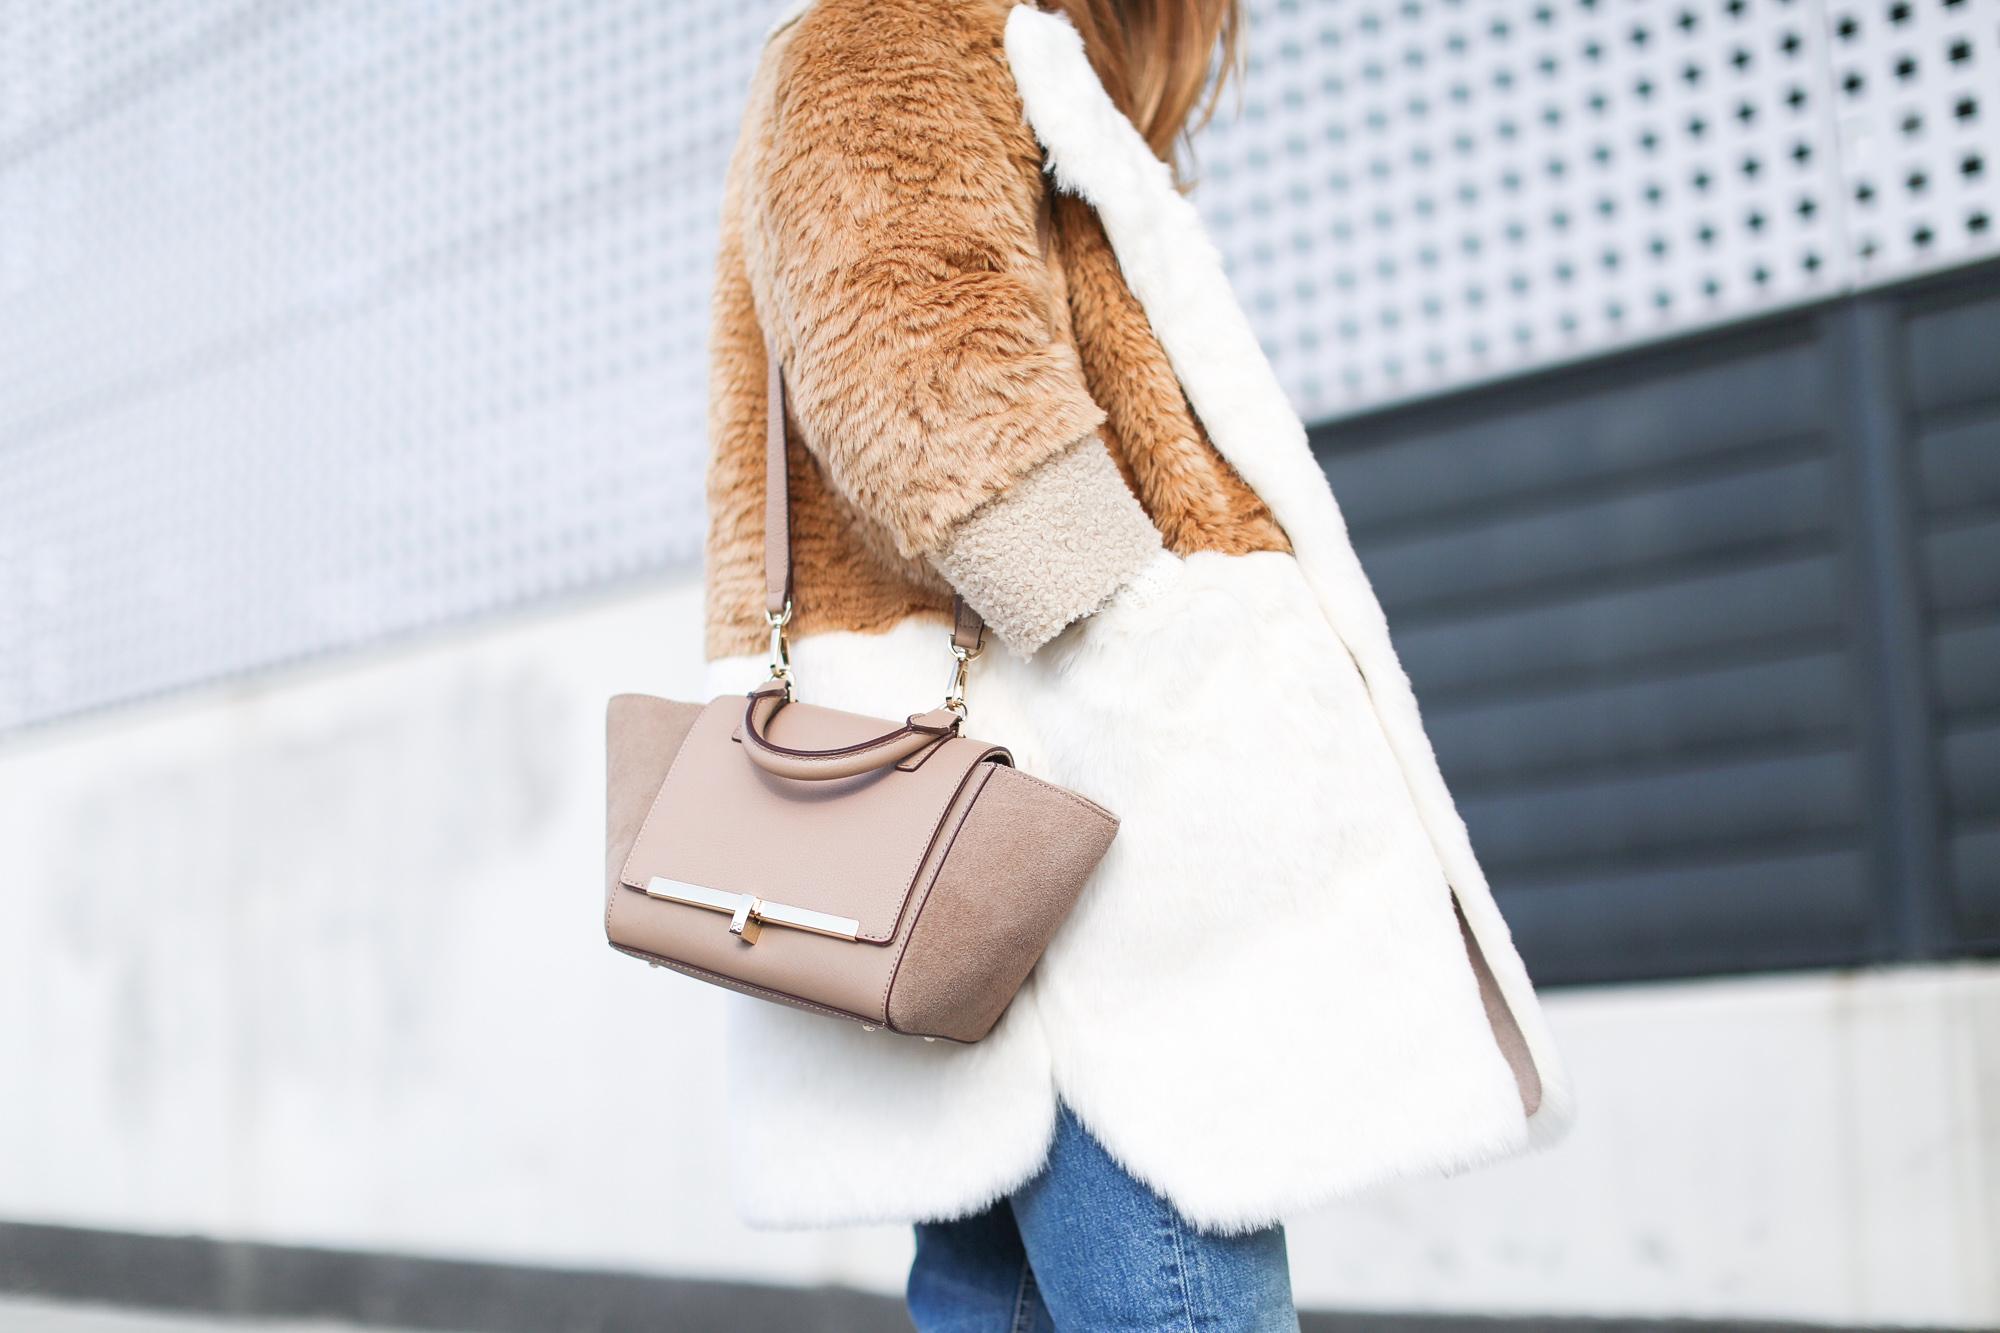 Clochet_streetstyle_fashionblogger_asosfauxfurteddycoat_pinkadidashamburg_leztinstreet_acnestudiosjeans_pop-8